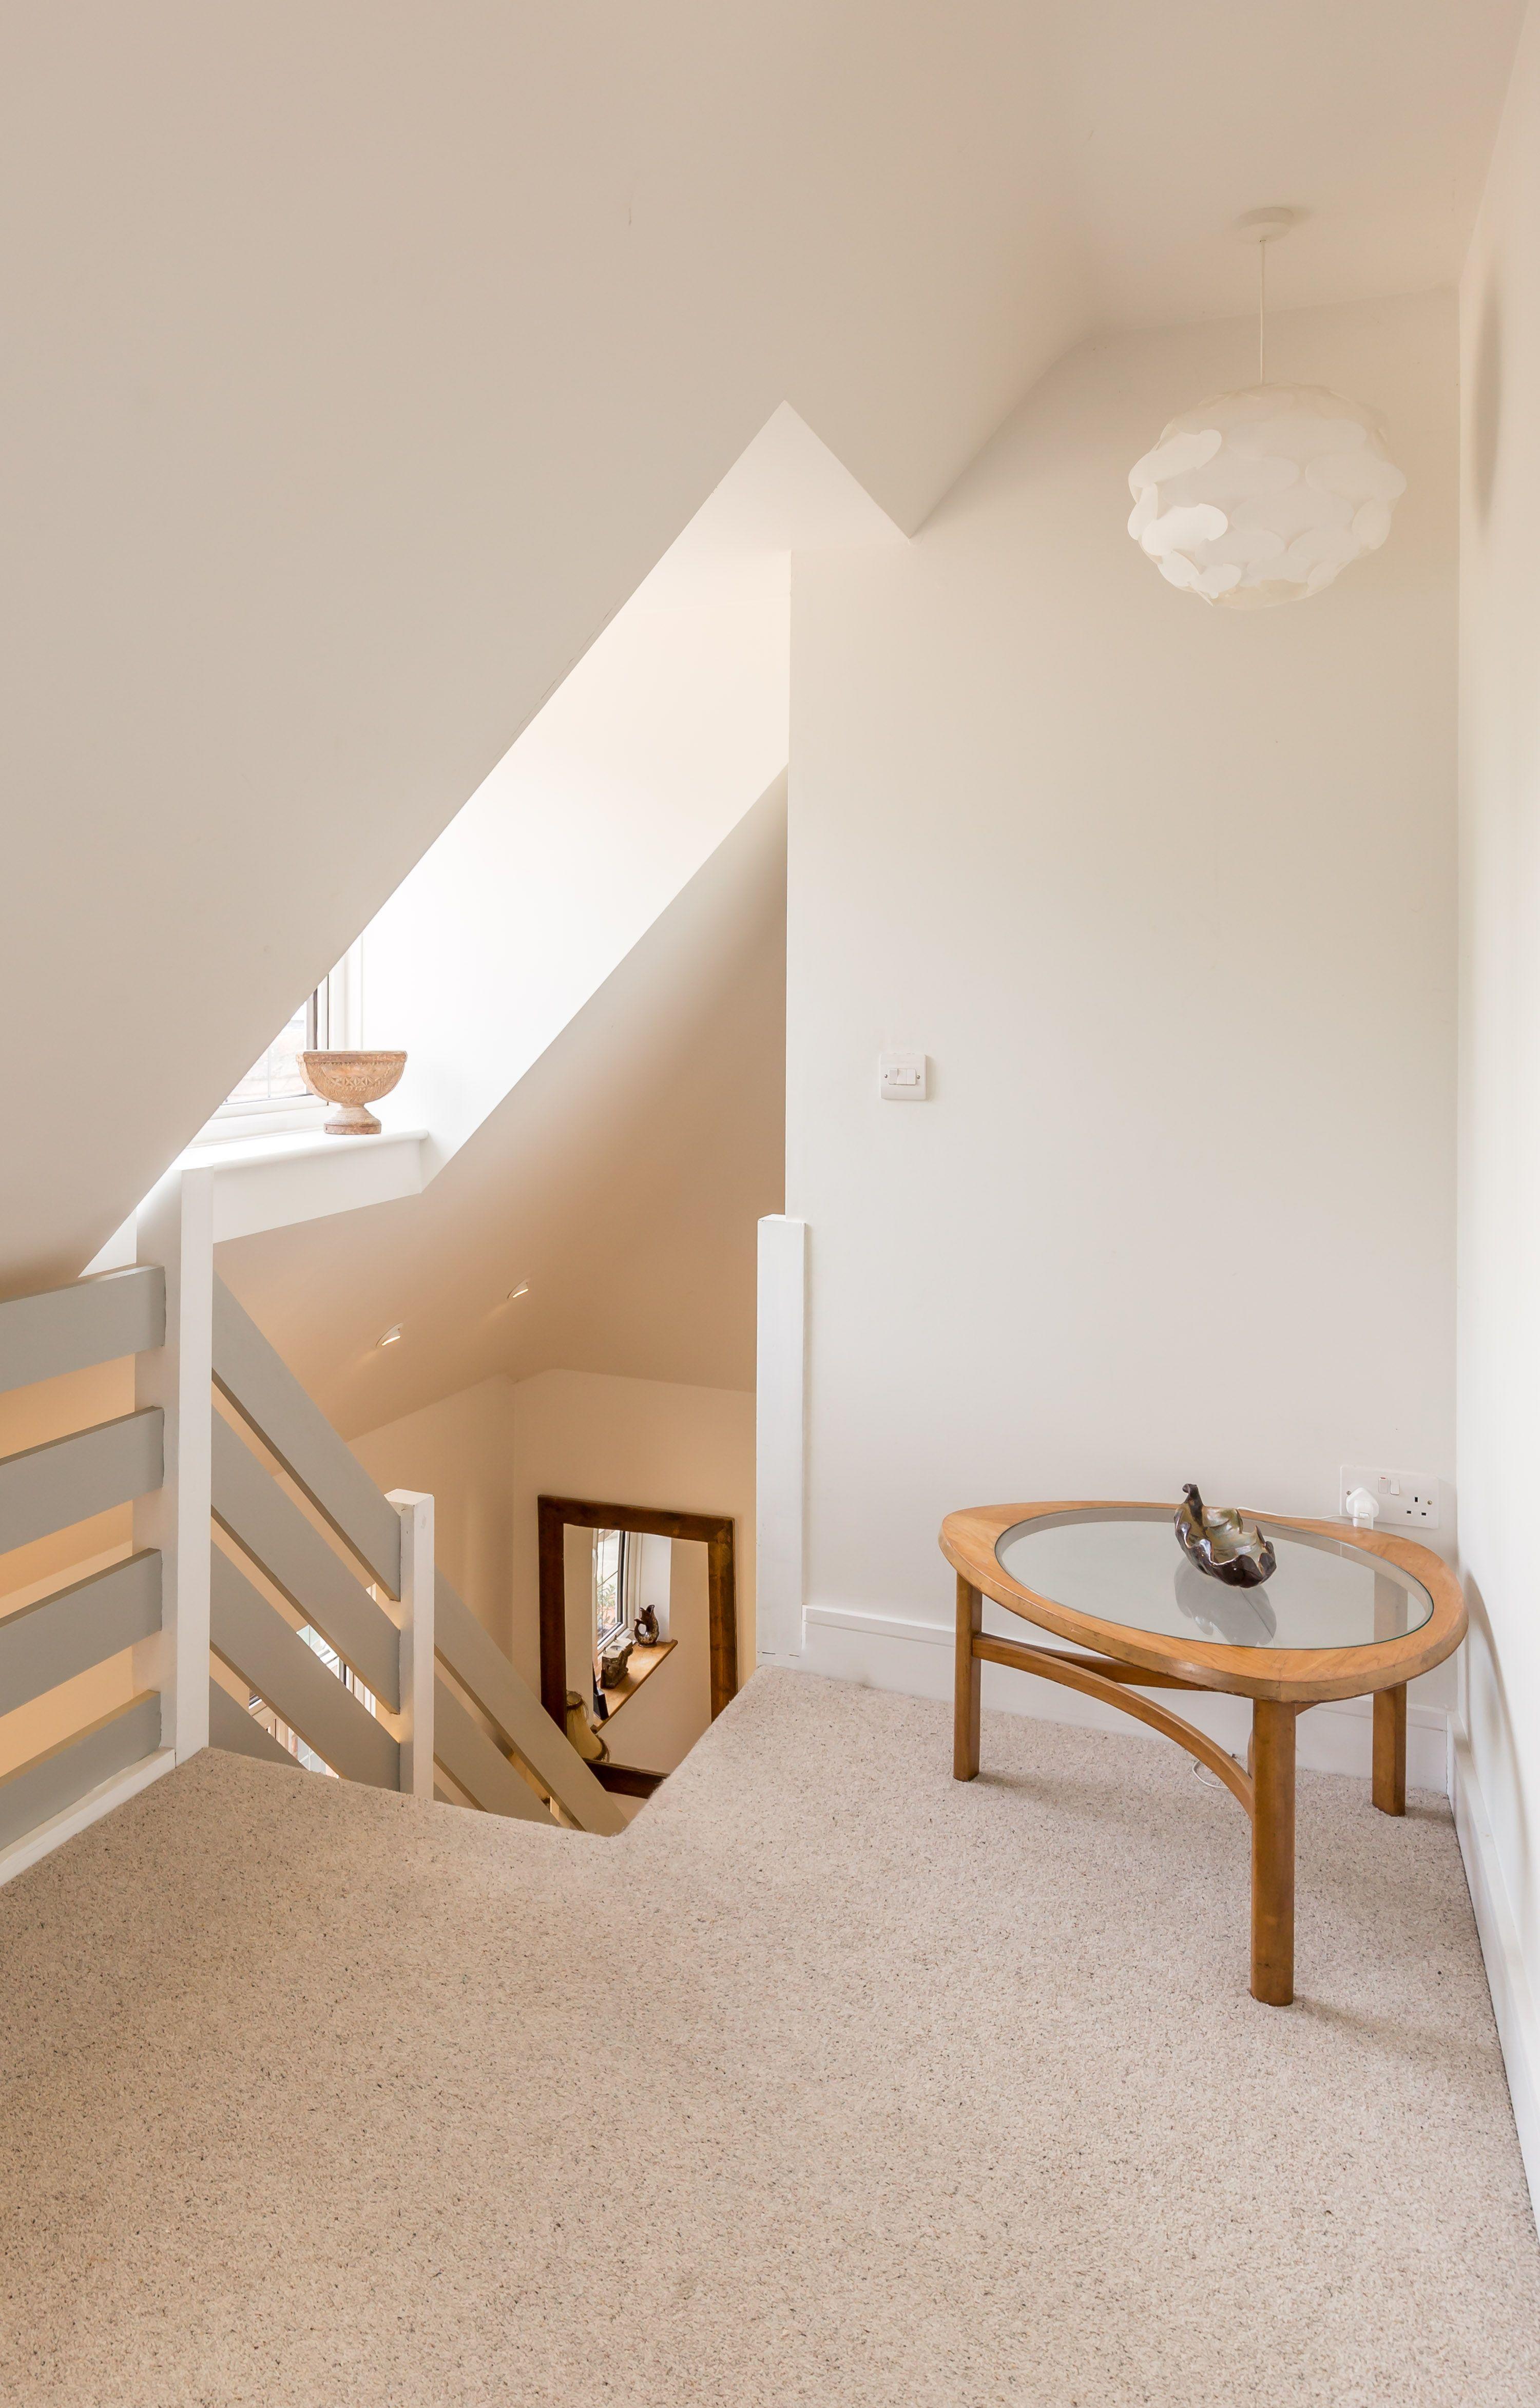 Loft conversion | gallery landing | circulation | sloped ...